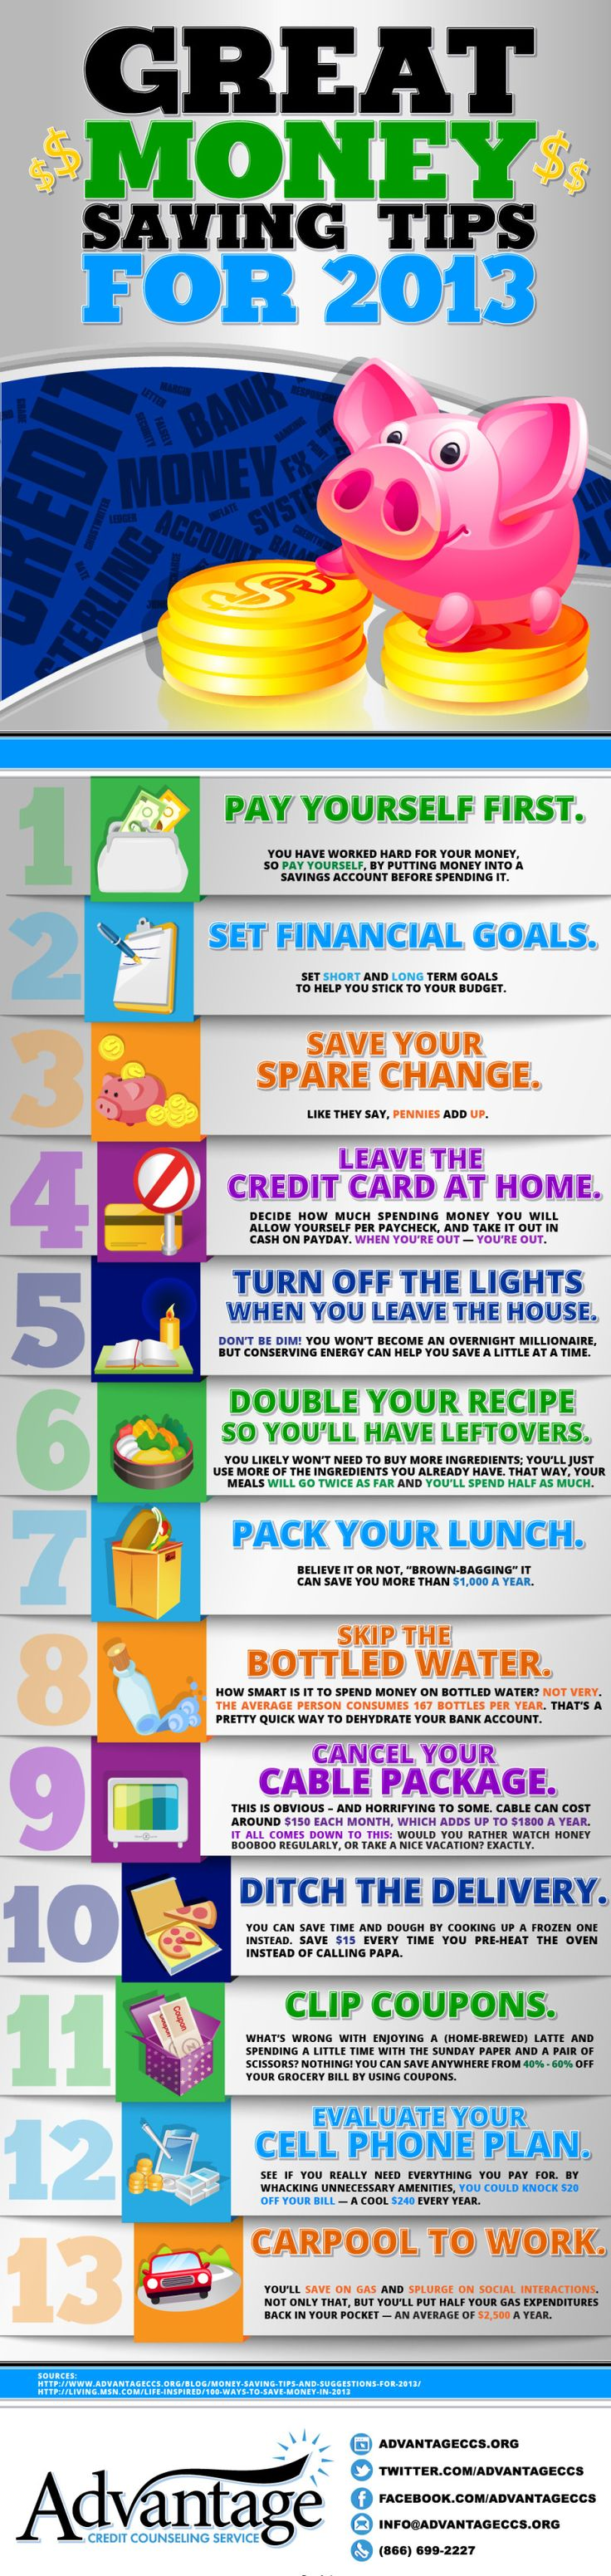 Great Money Saving Tips